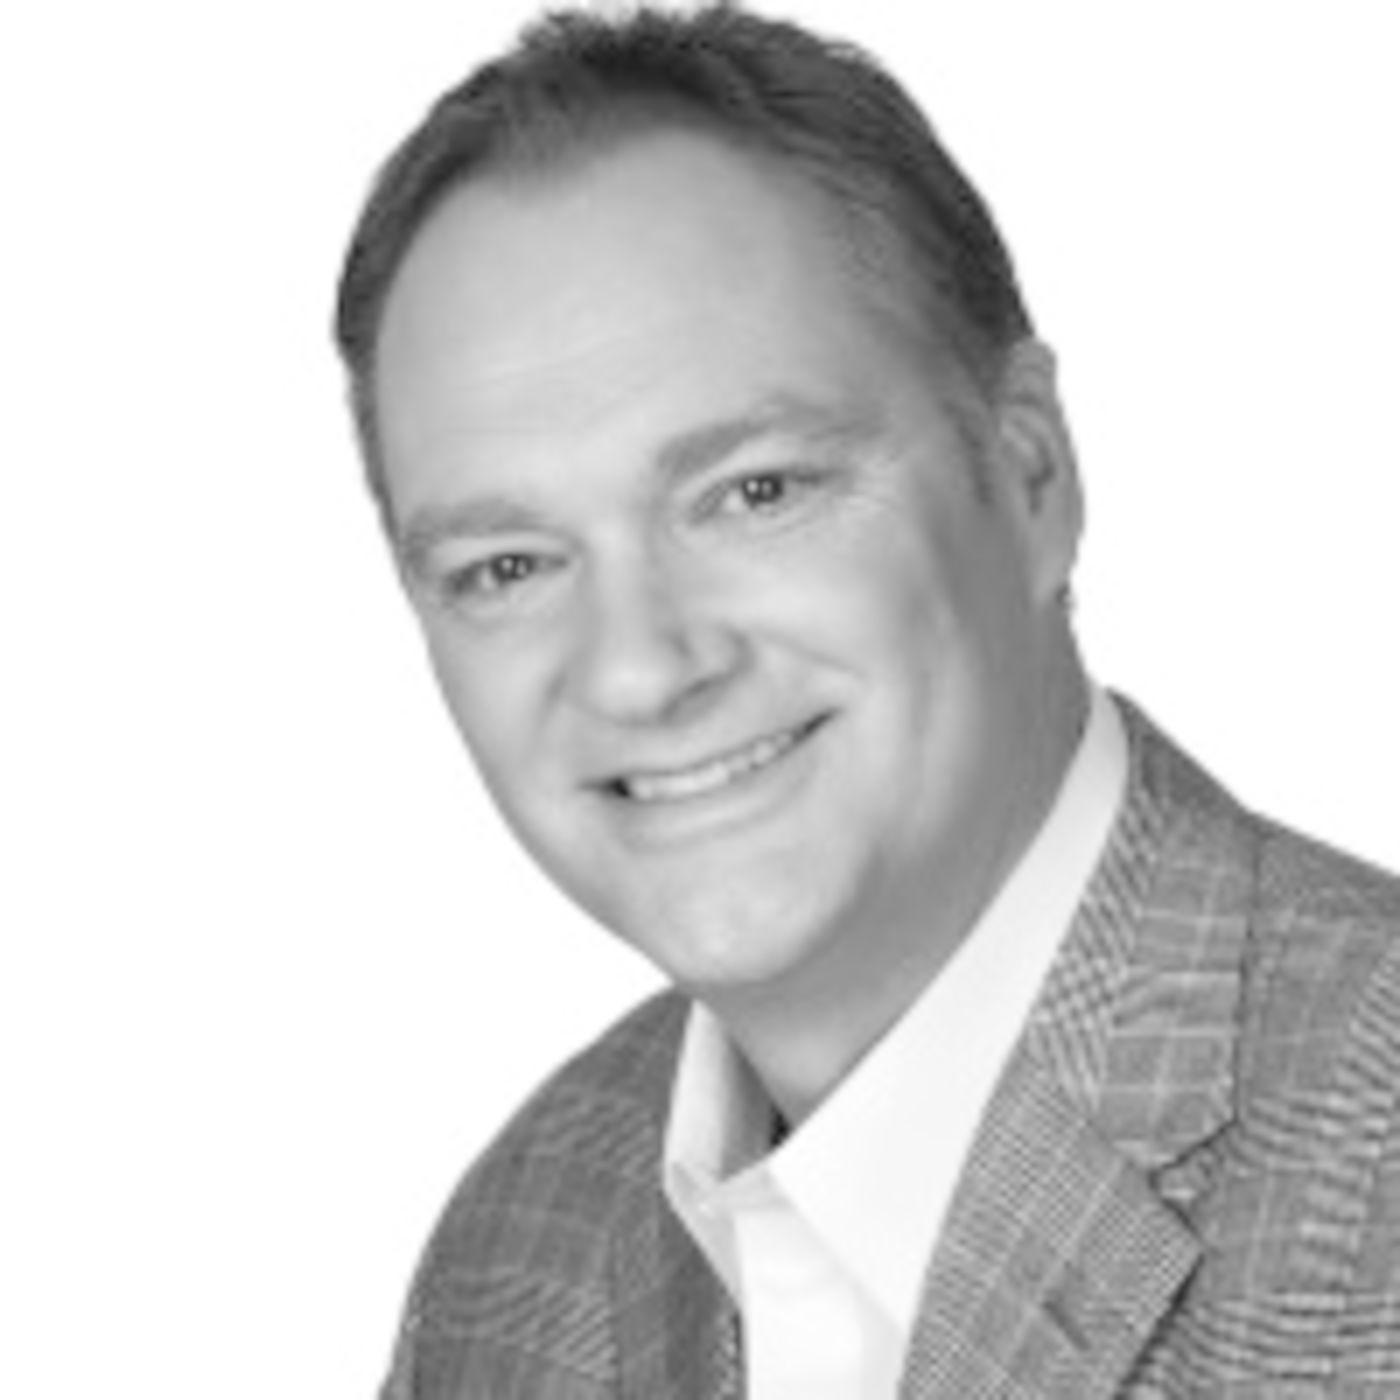 #20 -Bob Zukis - CEO, Digital Directors Network - Governing Cyber Risk on Corporate Boards